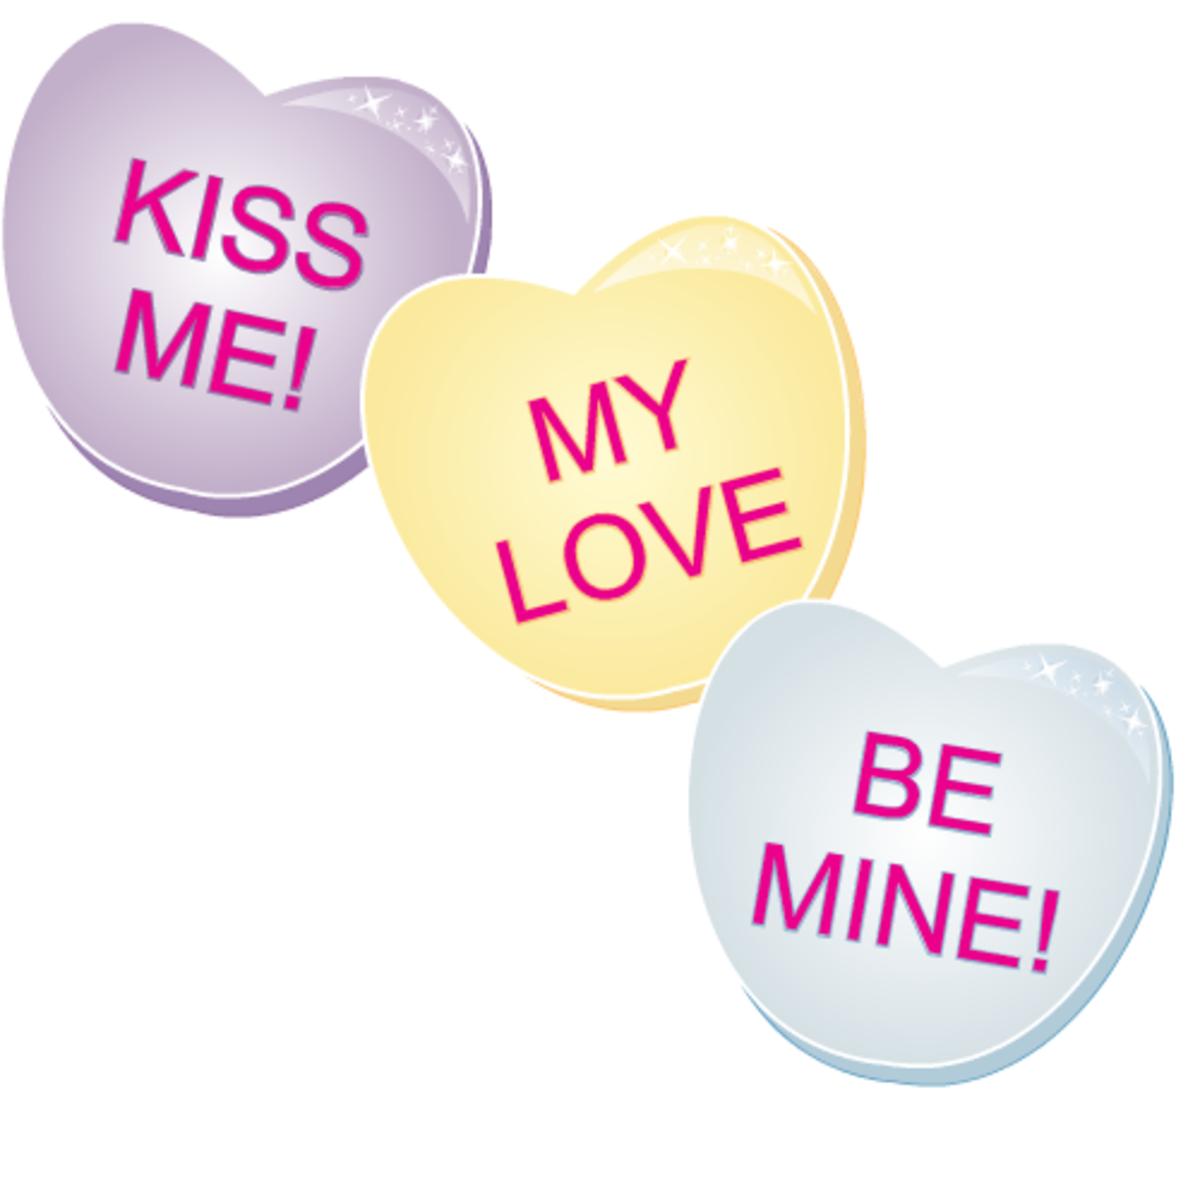 Free valentine clip art: Three candy hearts